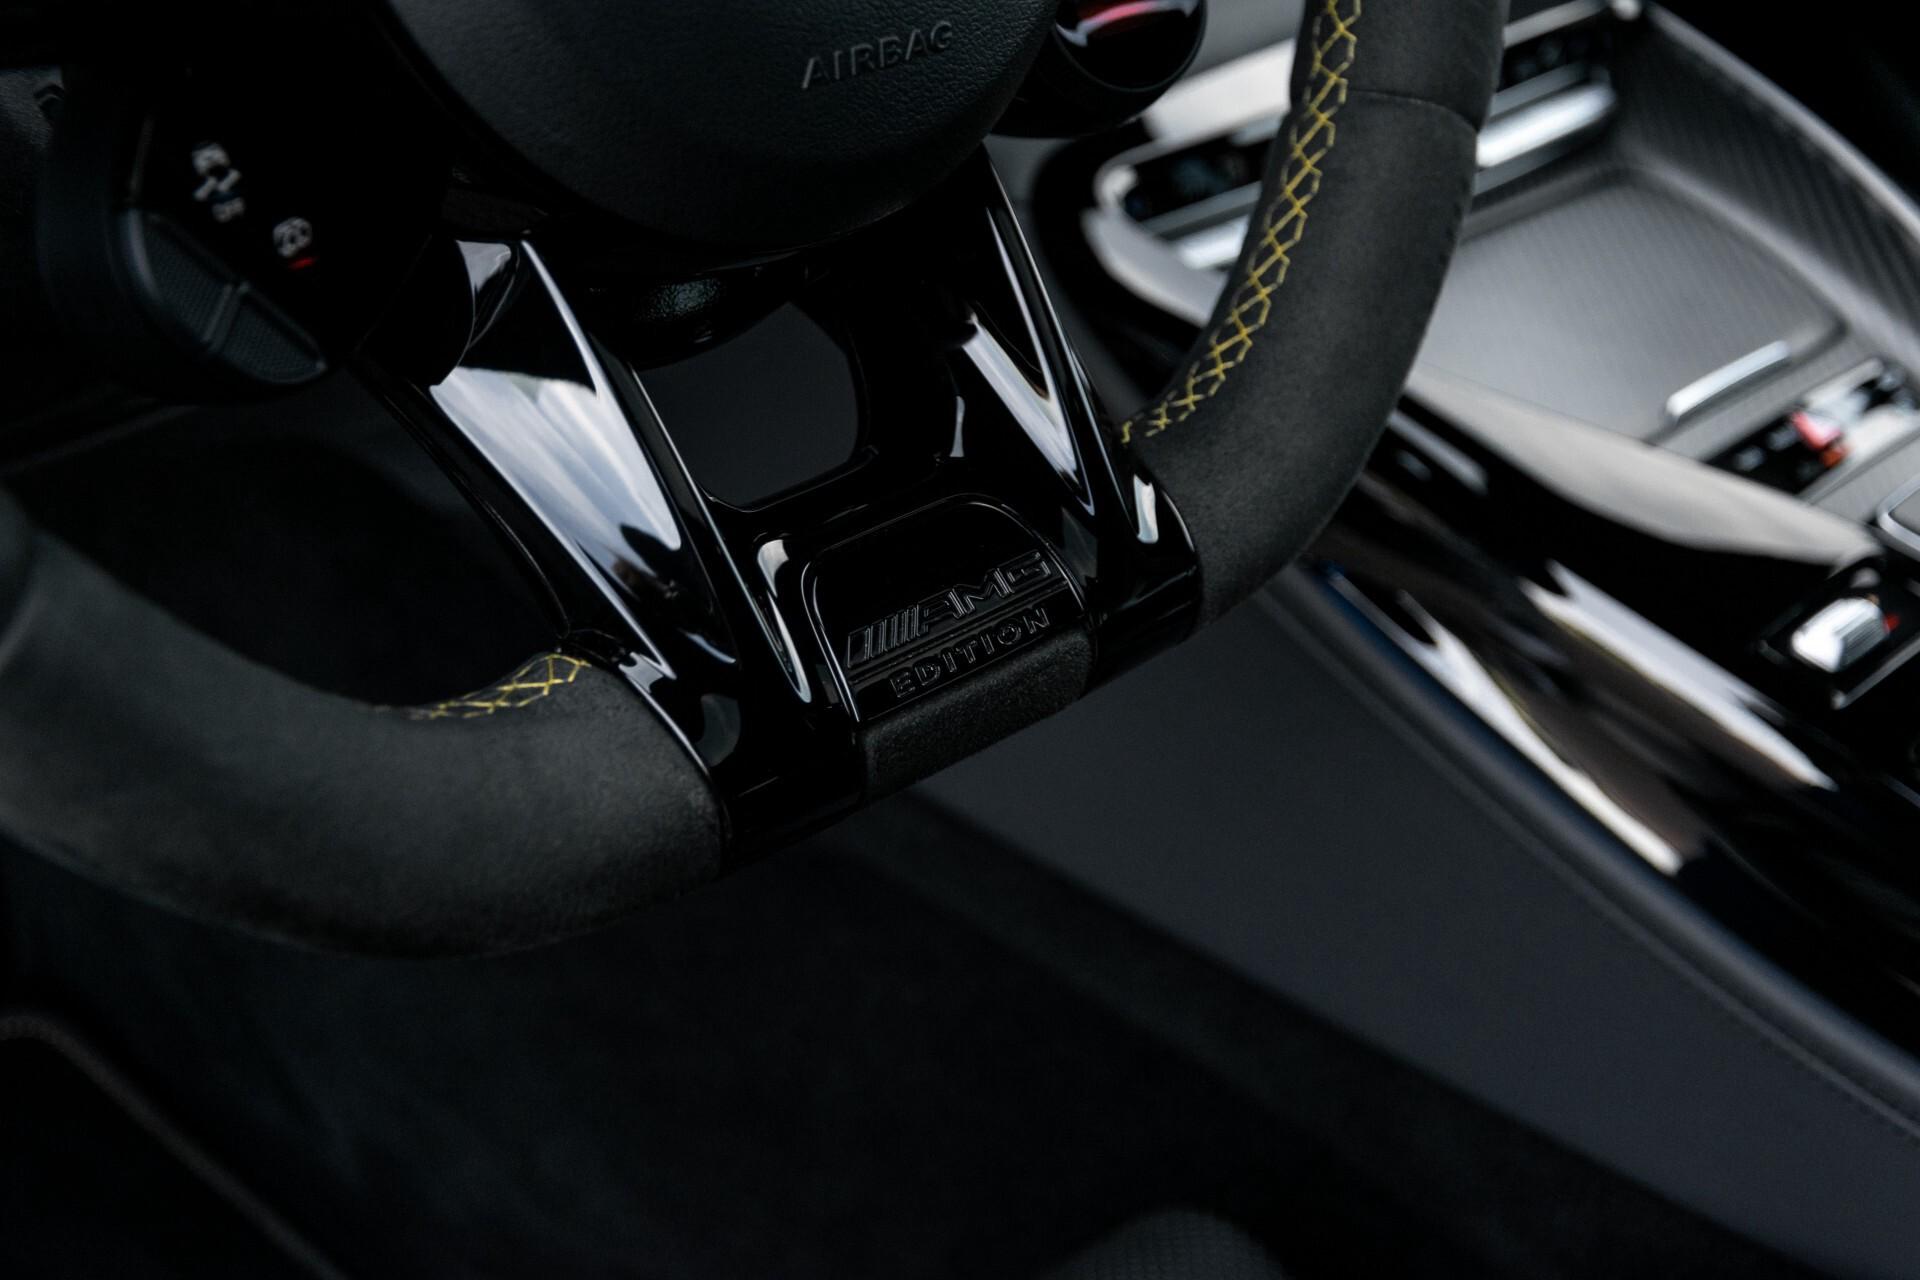 Mercedes-Benz AMG GT 4-Door Coupe 63 S 4MATIC+ Edition 1 Keramisch/Carbon/First Class/Dynamic Plus/Burmester High End 3D Aut9 Foto 36